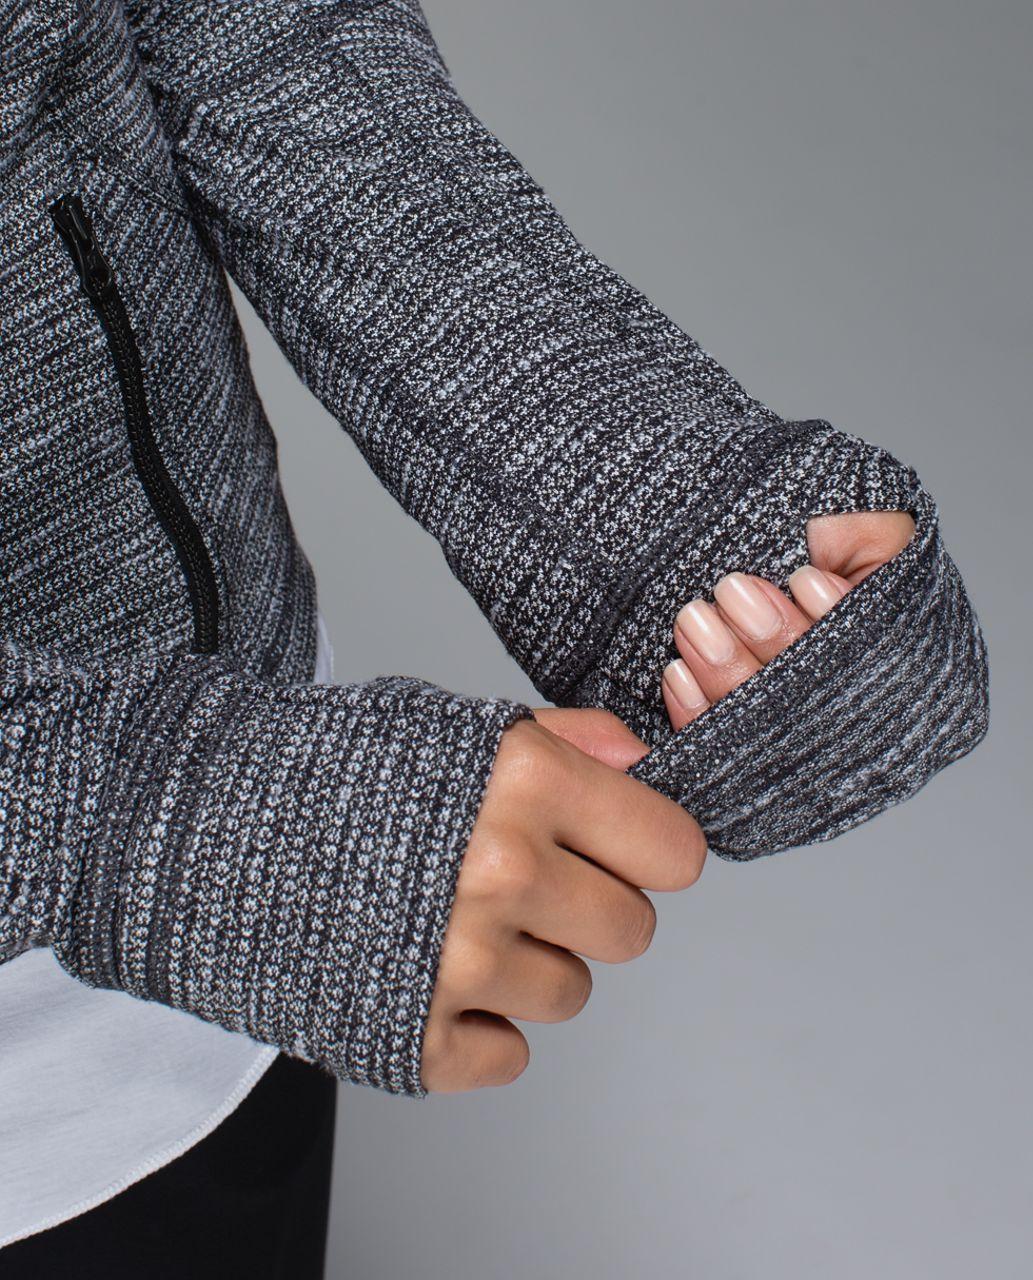 Lululemon Forme Jacket (Cuffins) - Coco Pique Black